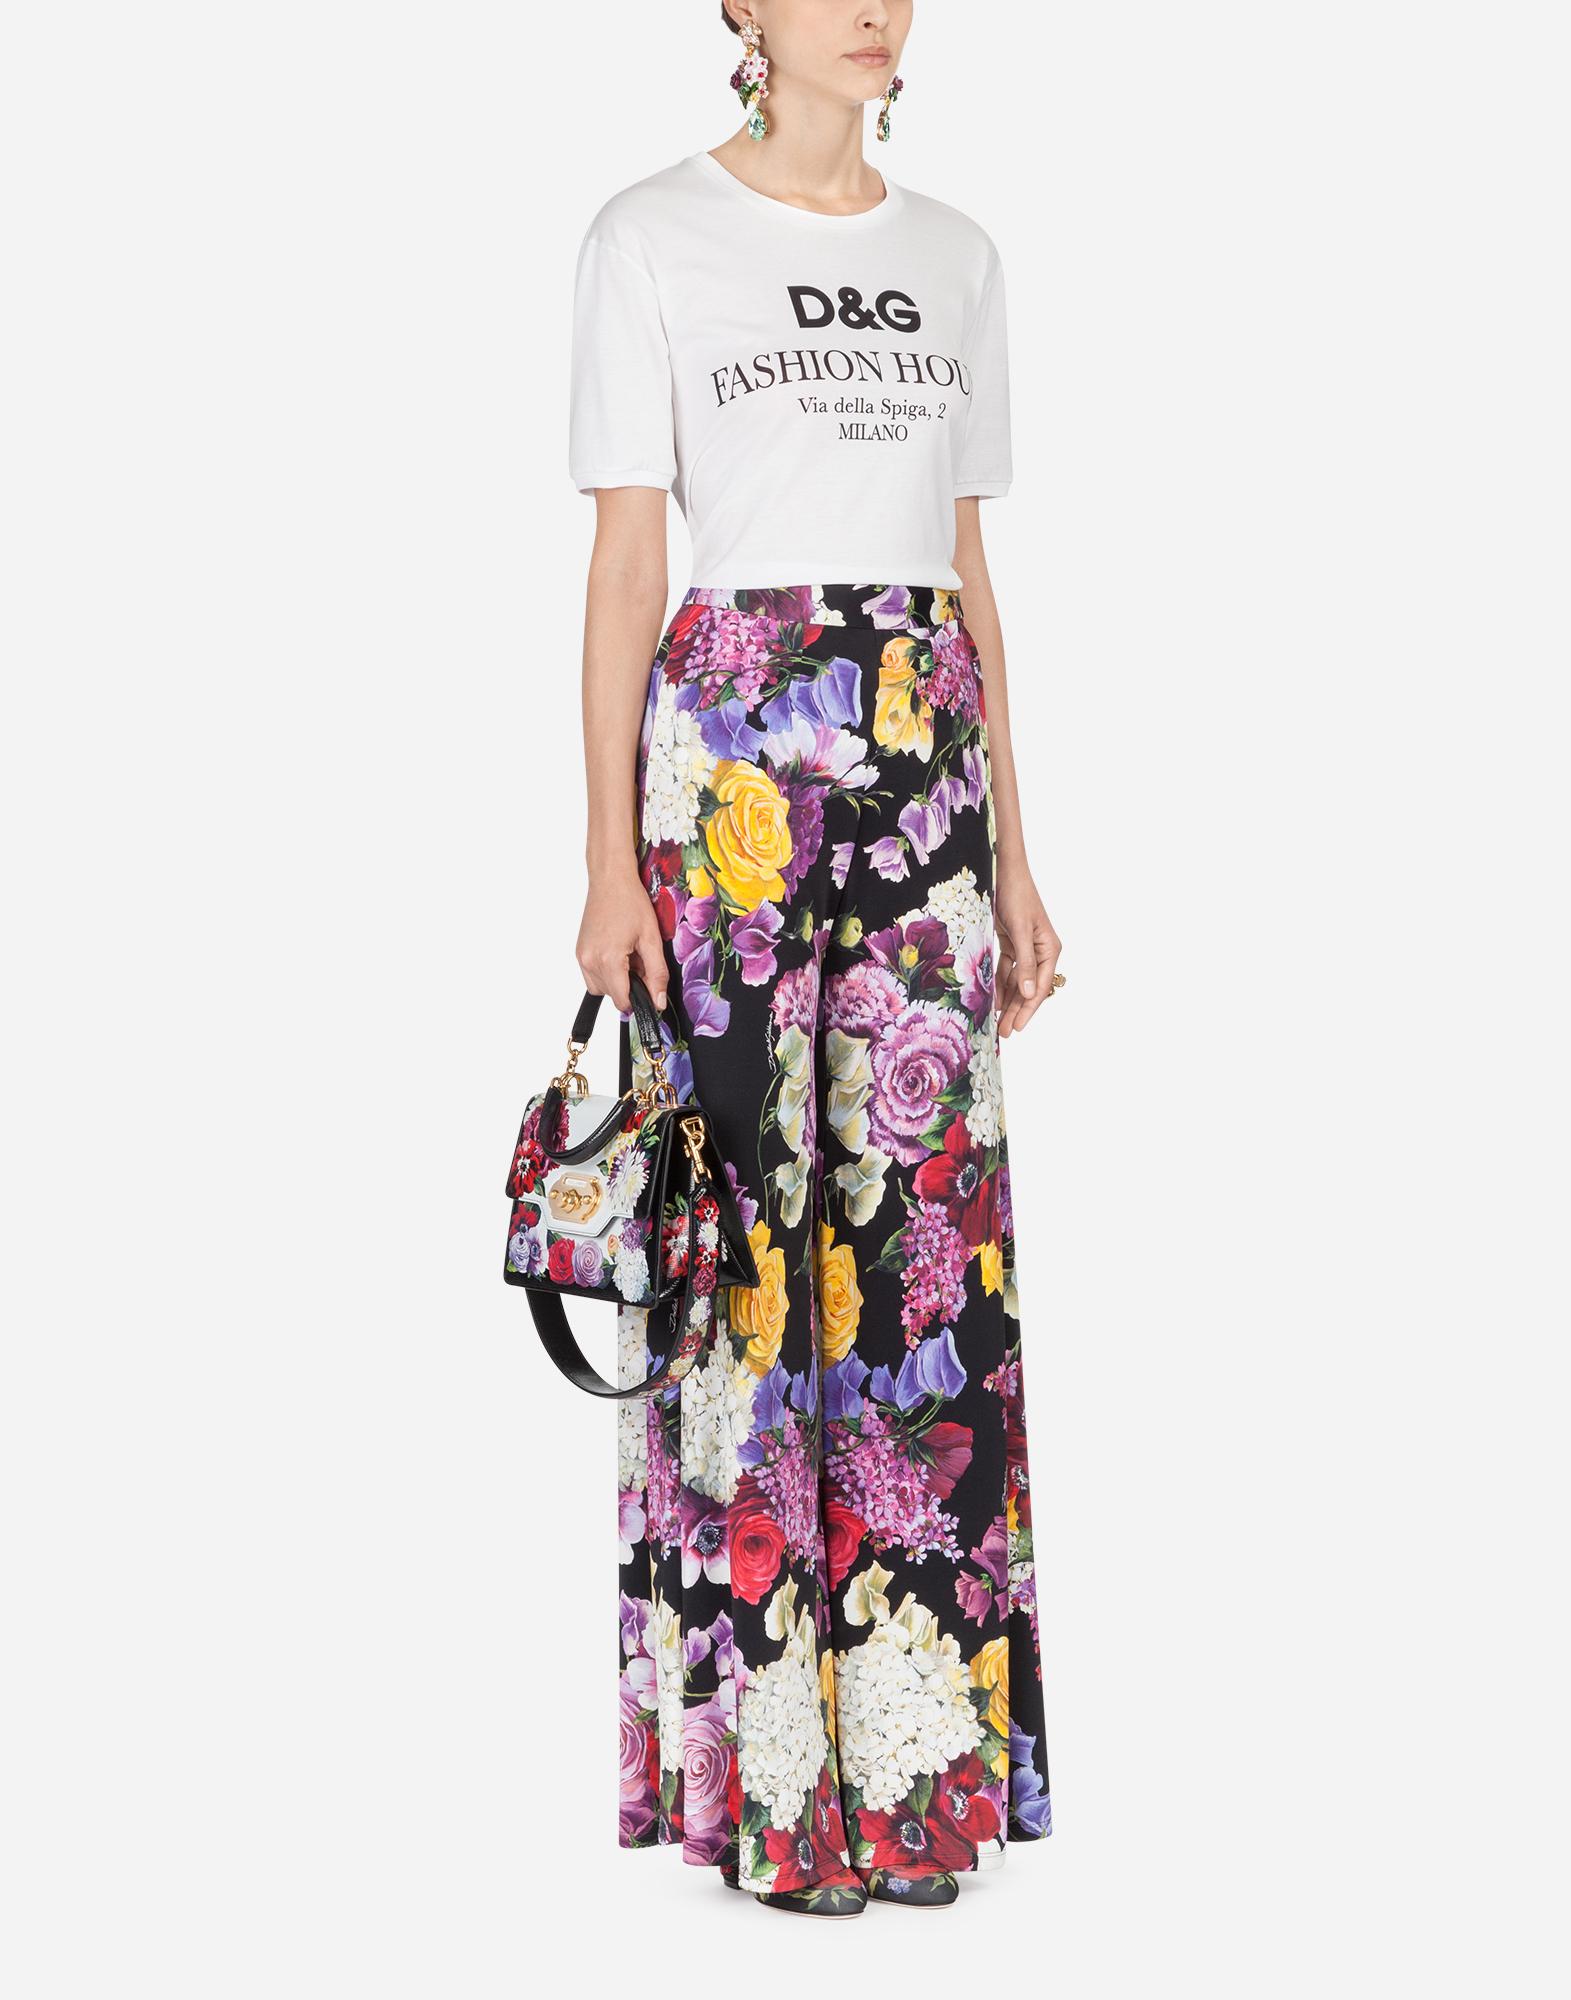 Dolce & Gabbana PRINTED COTTON T-SHIRT